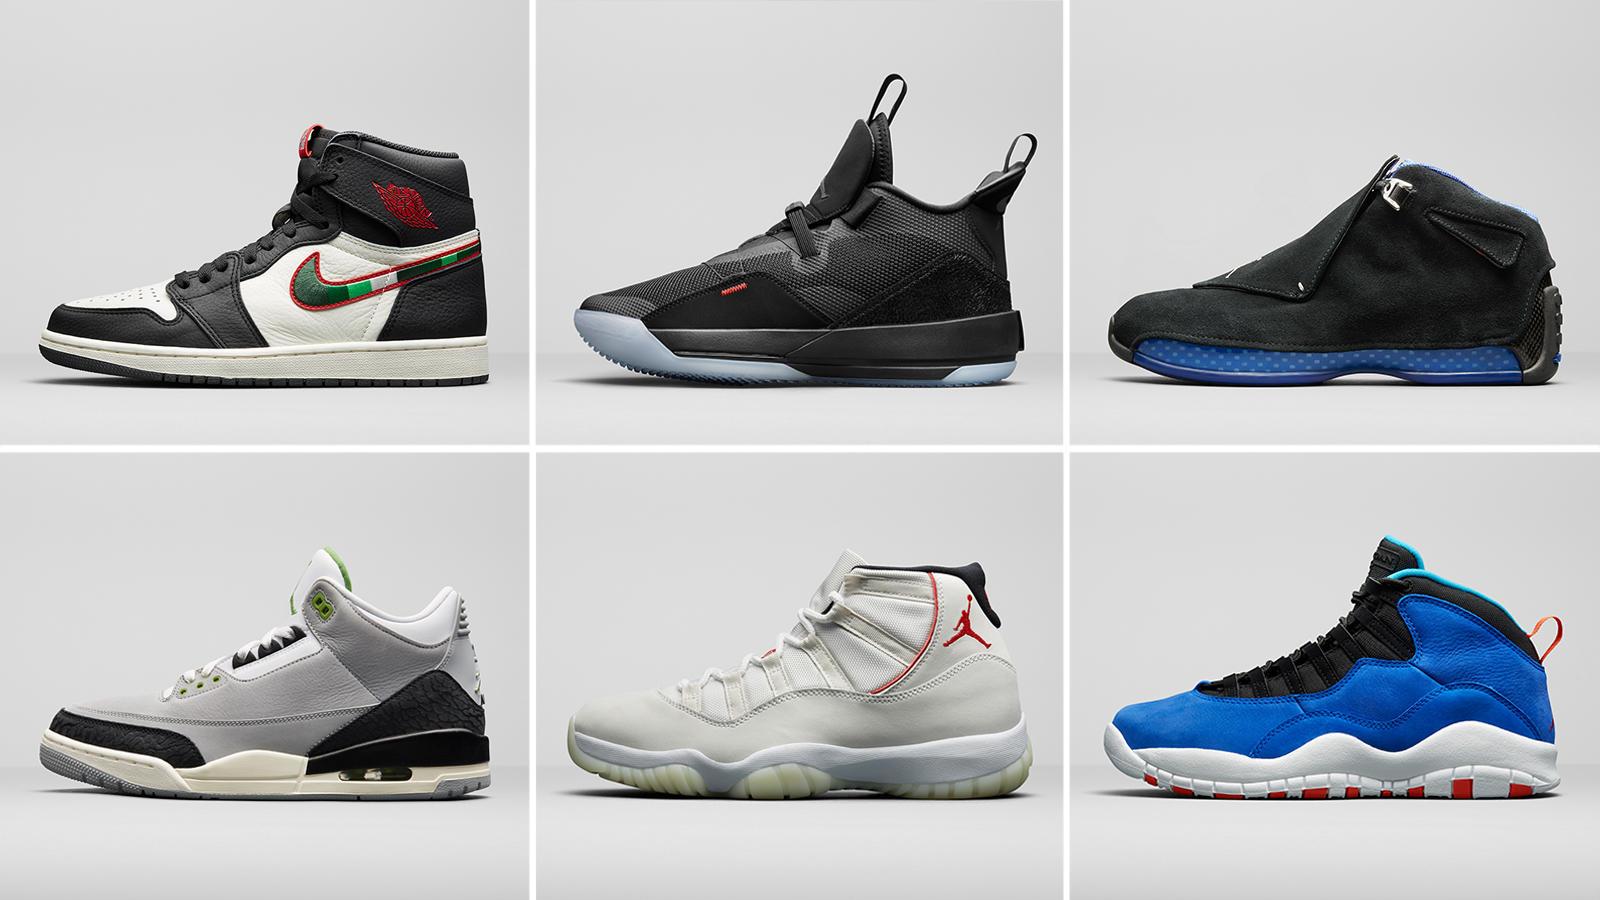 New Jordan Release Dates: Holiday 2018